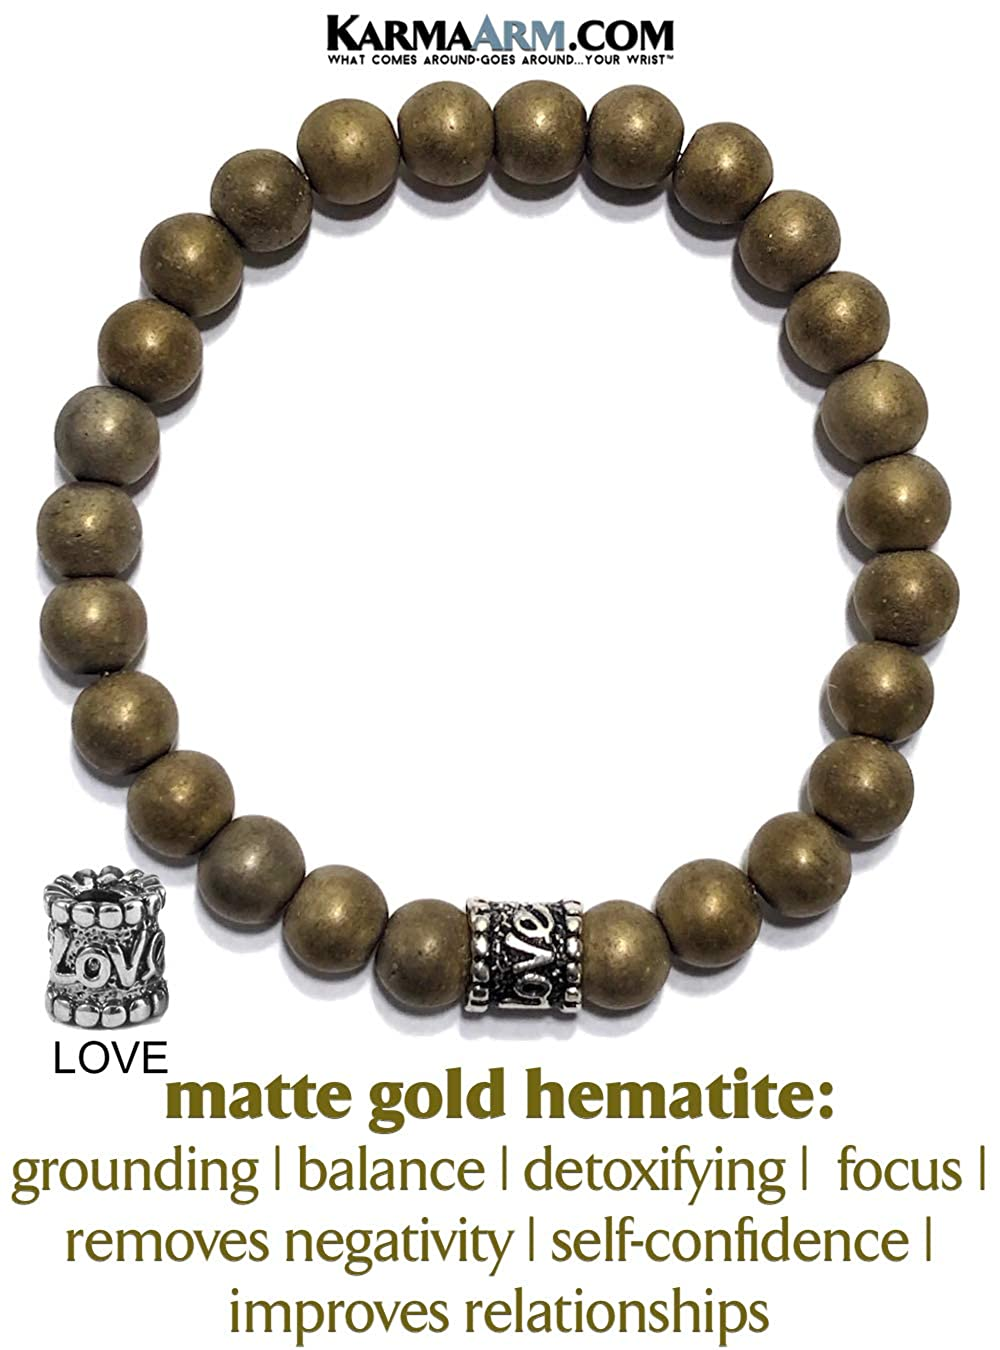 Love Bead Boho Zen Self-Care Meditation Wellness Jewelry KarmaArm Anxiety Bracelet Yoga Chakra Reiki Healing Energy Bracelet Affair of The Heart : Matte Gold Hematite